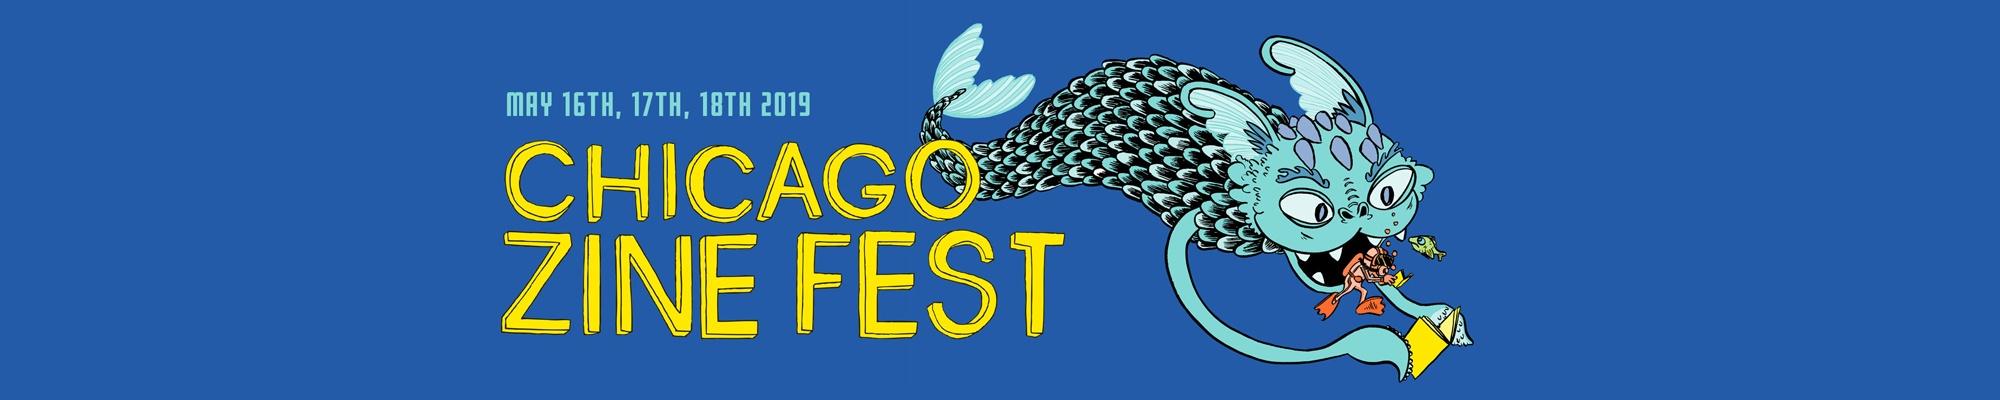 chicagozinefest Cover